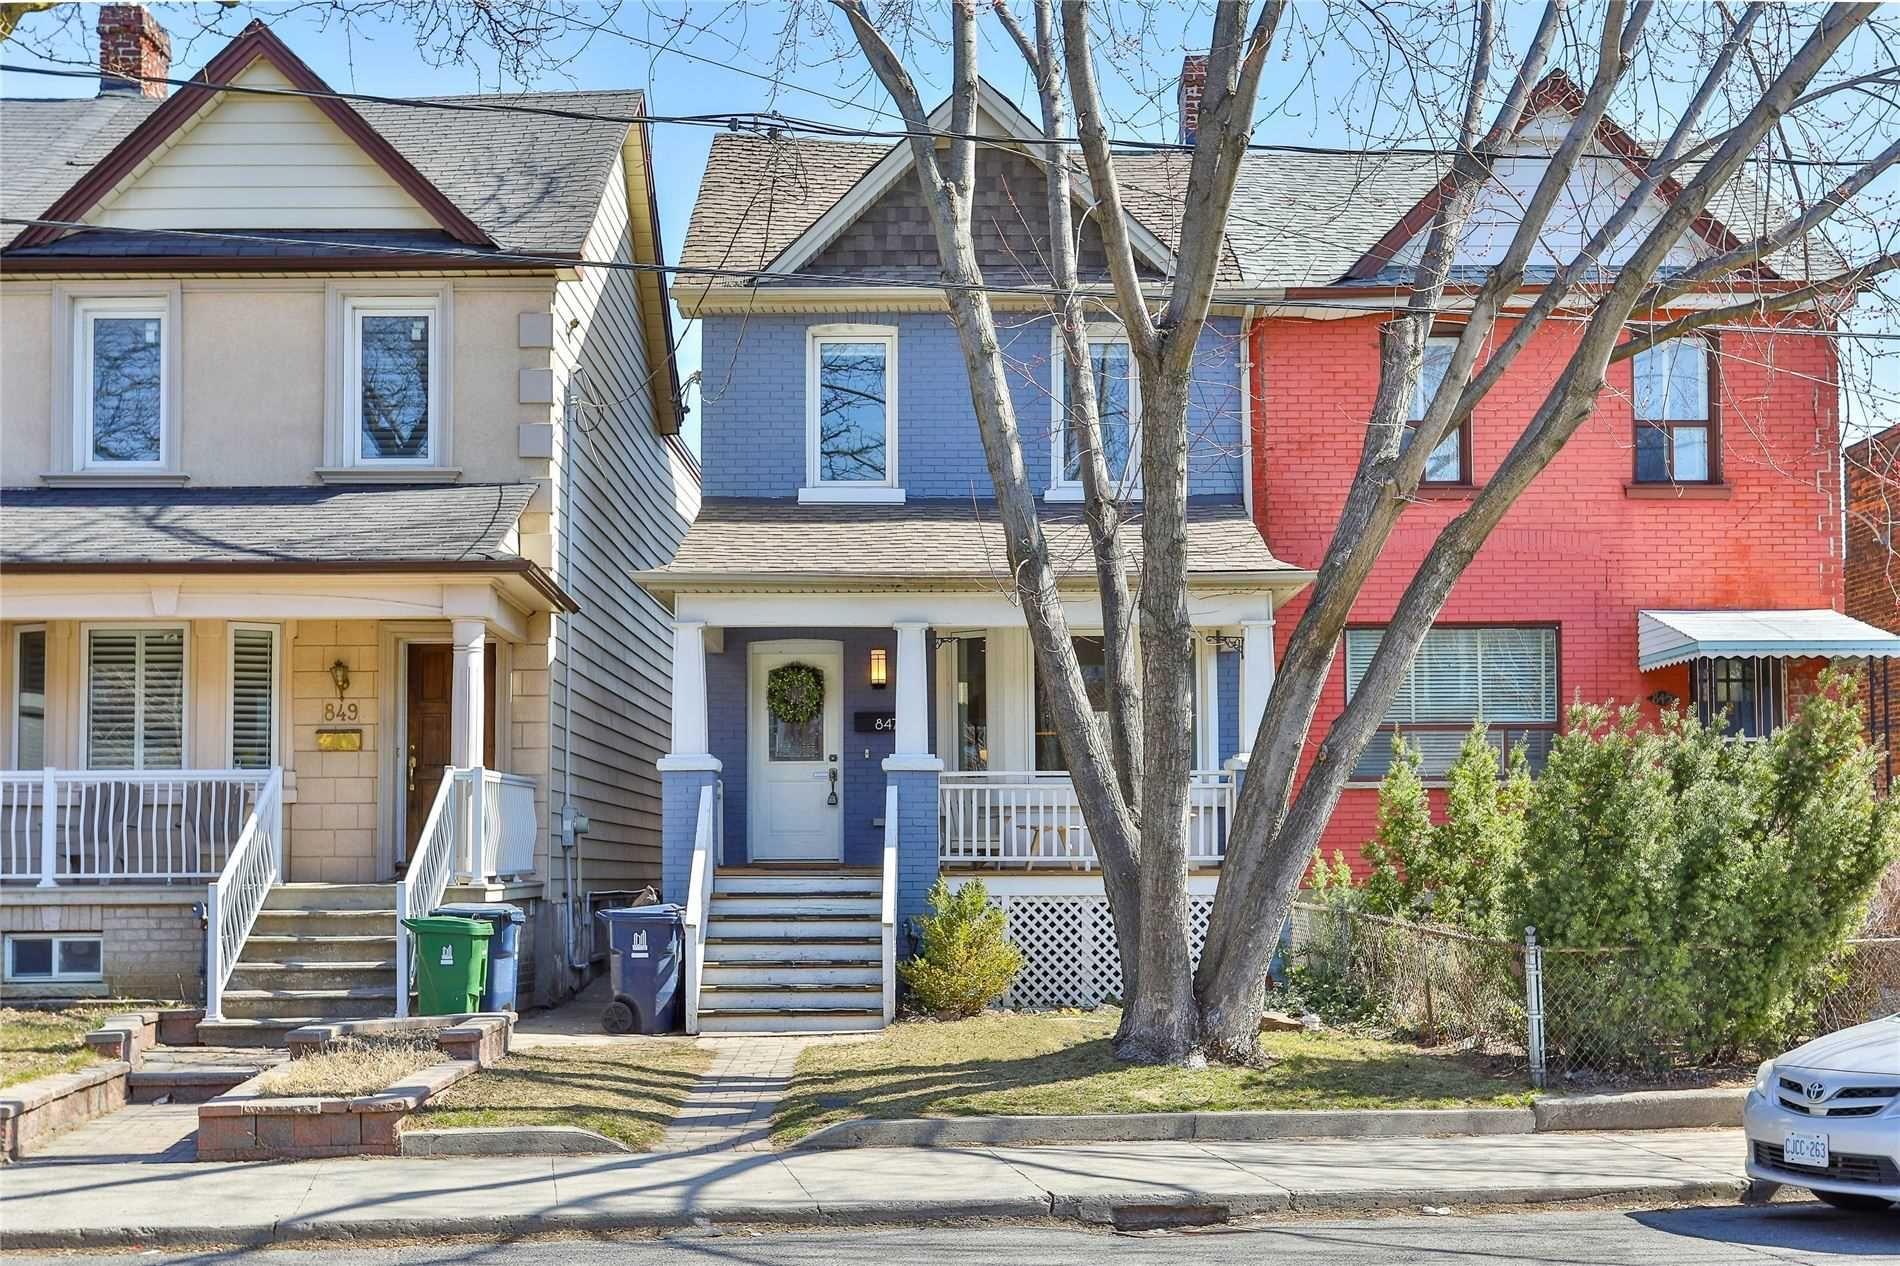 Main Photo: 847 Lansdowne Avenue in Toronto: Dovercourt-Wallace Emerson-Junction House (2-Storey) for sale (Toronto W02)  : MLS®# W5164920